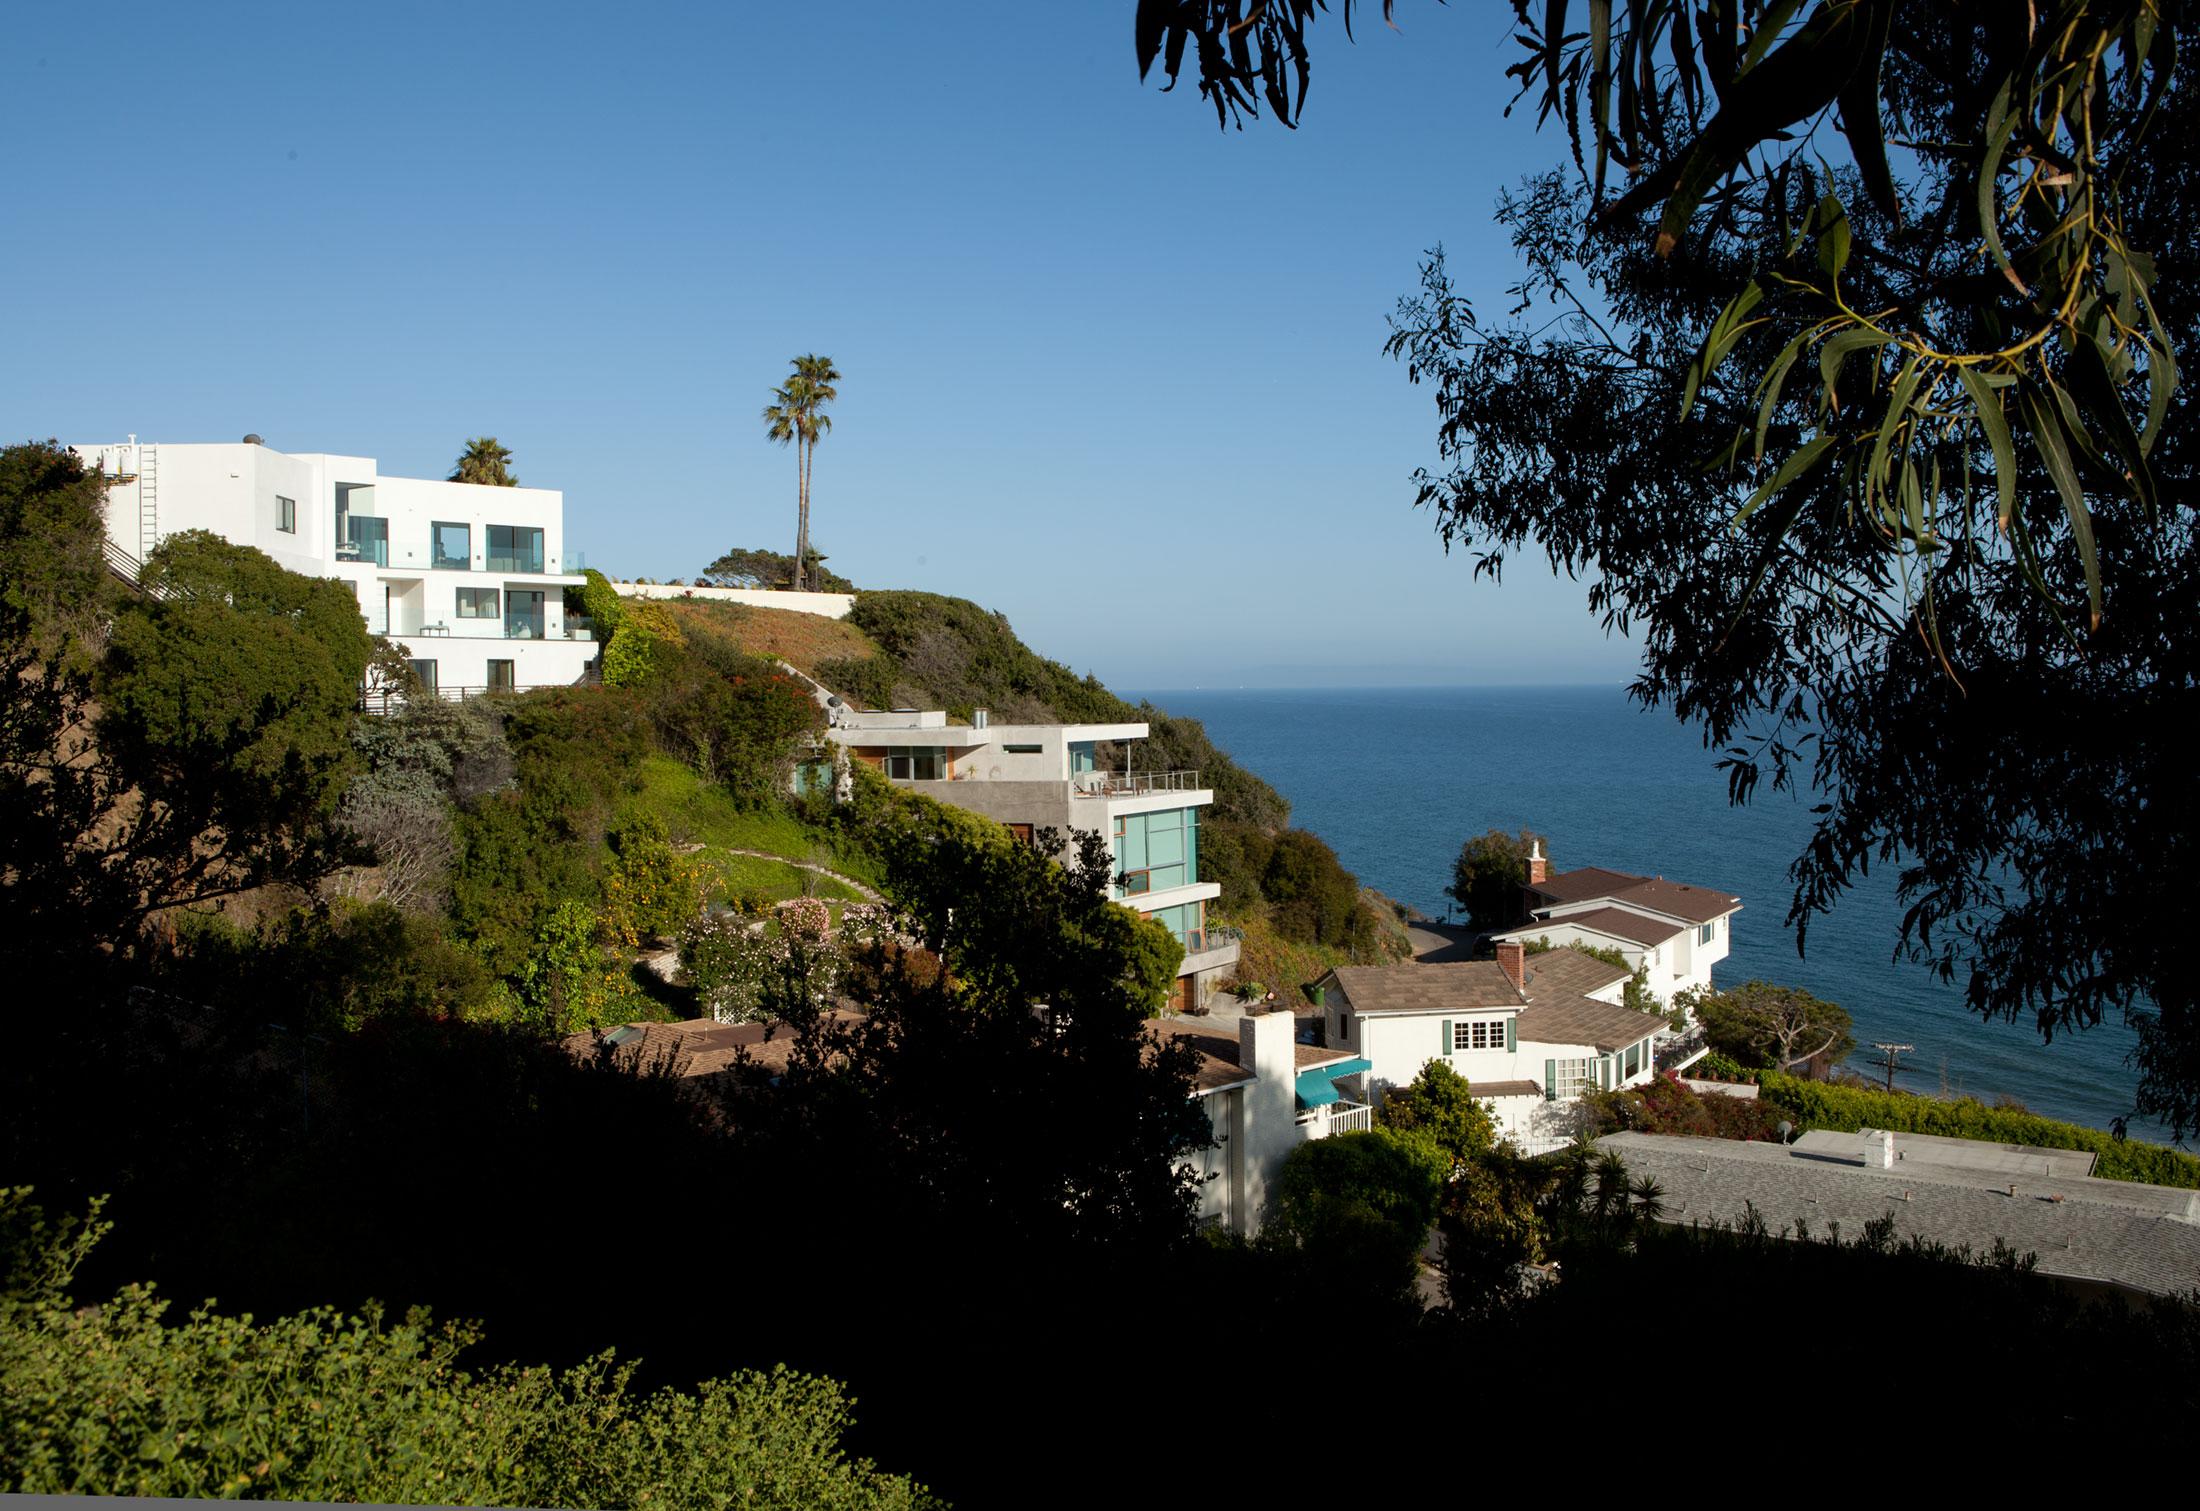 modern-architecture-residential-remodel-stone-inspirational-view-shubindonaldson-revello-residence-1